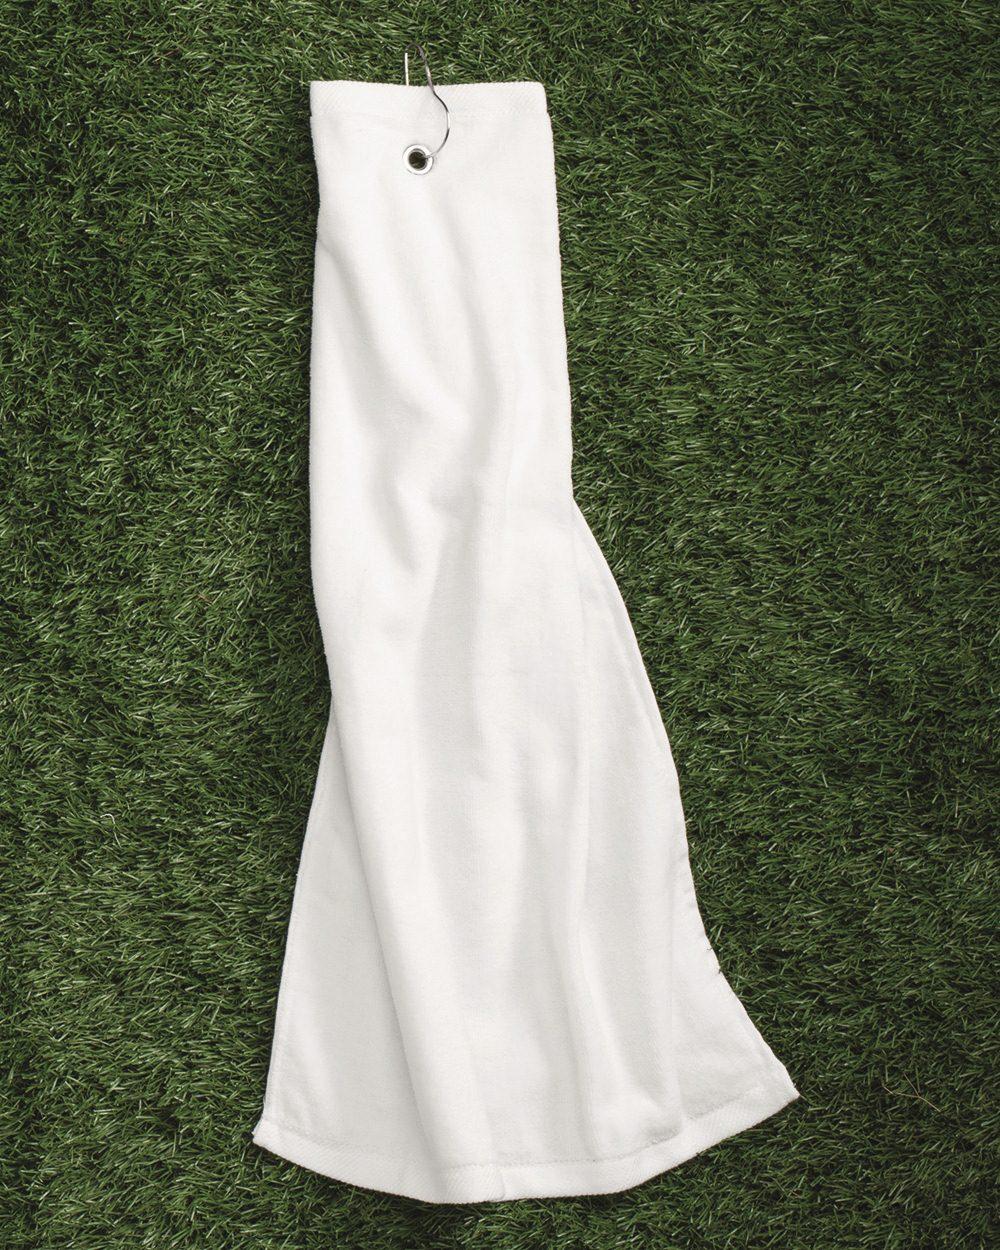 Carmel Towel Company Tri-Fold Hemmed Towel - C1624TGH